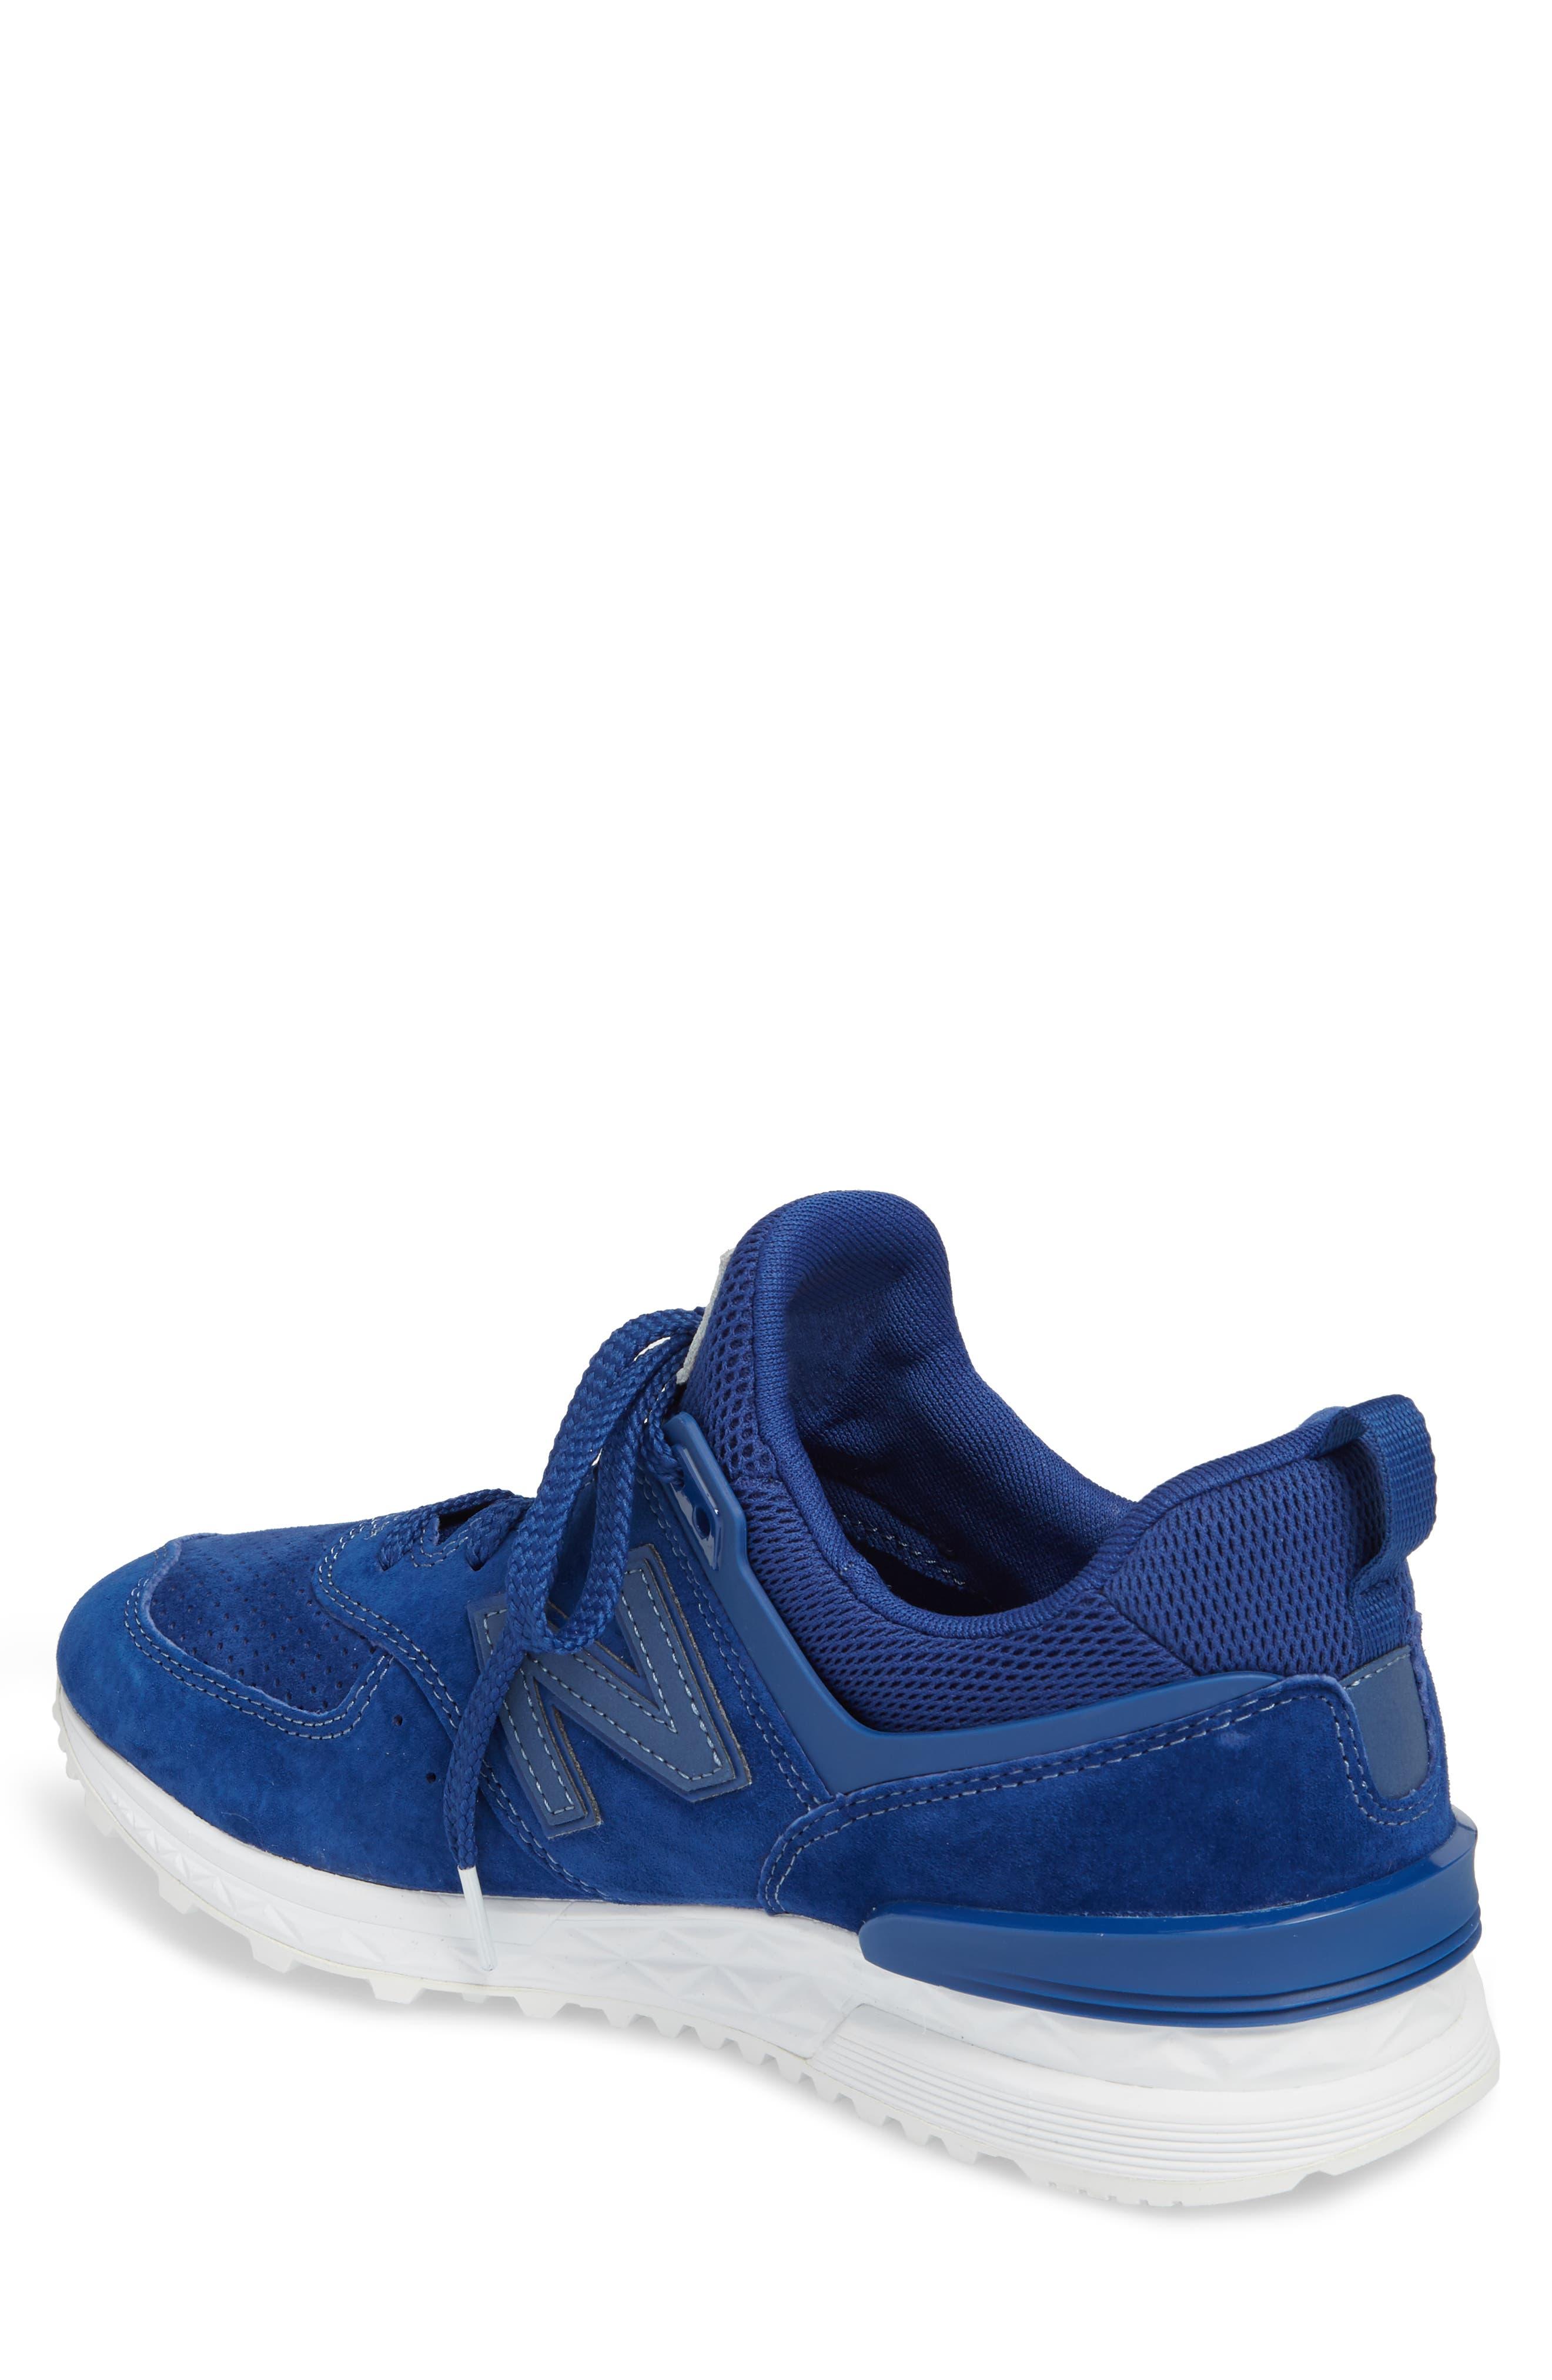 574 Sport Sneaker,                             Alternate thumbnail 2, color,                             Atlantic